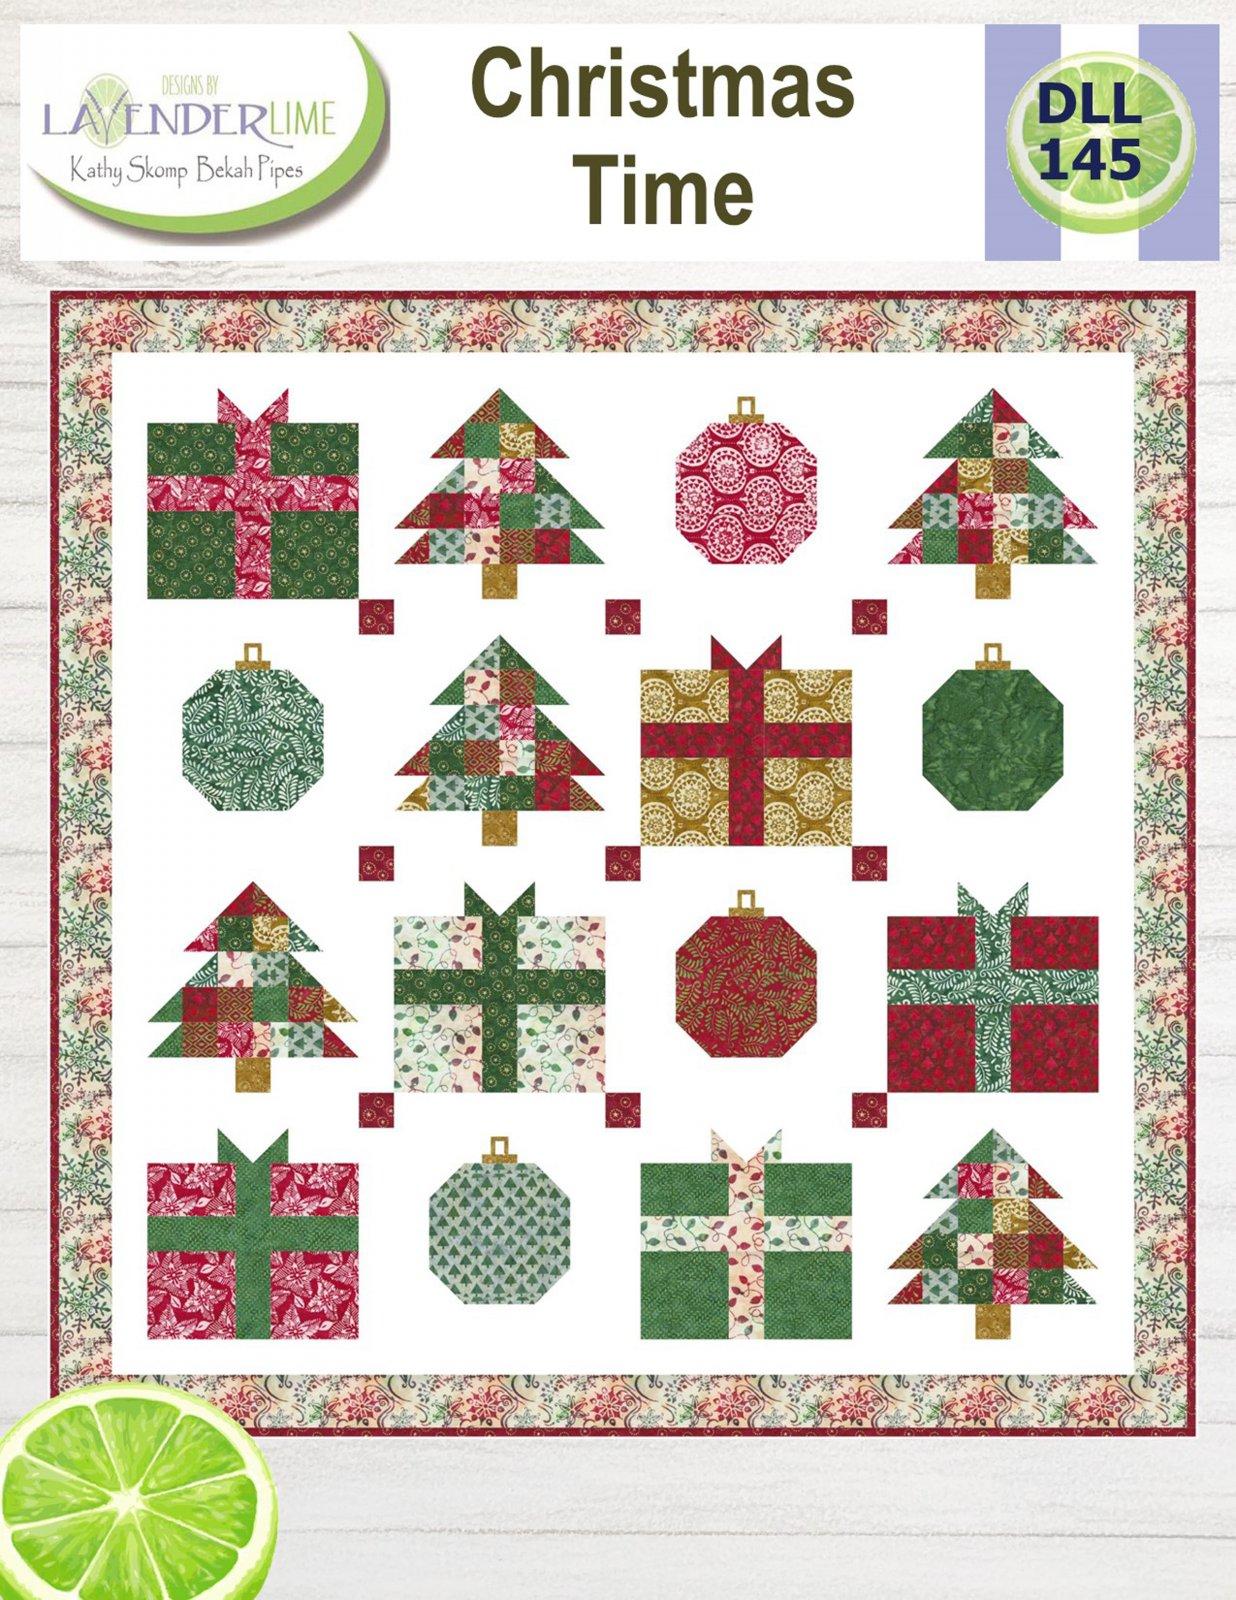 Christmas Time PDF Download